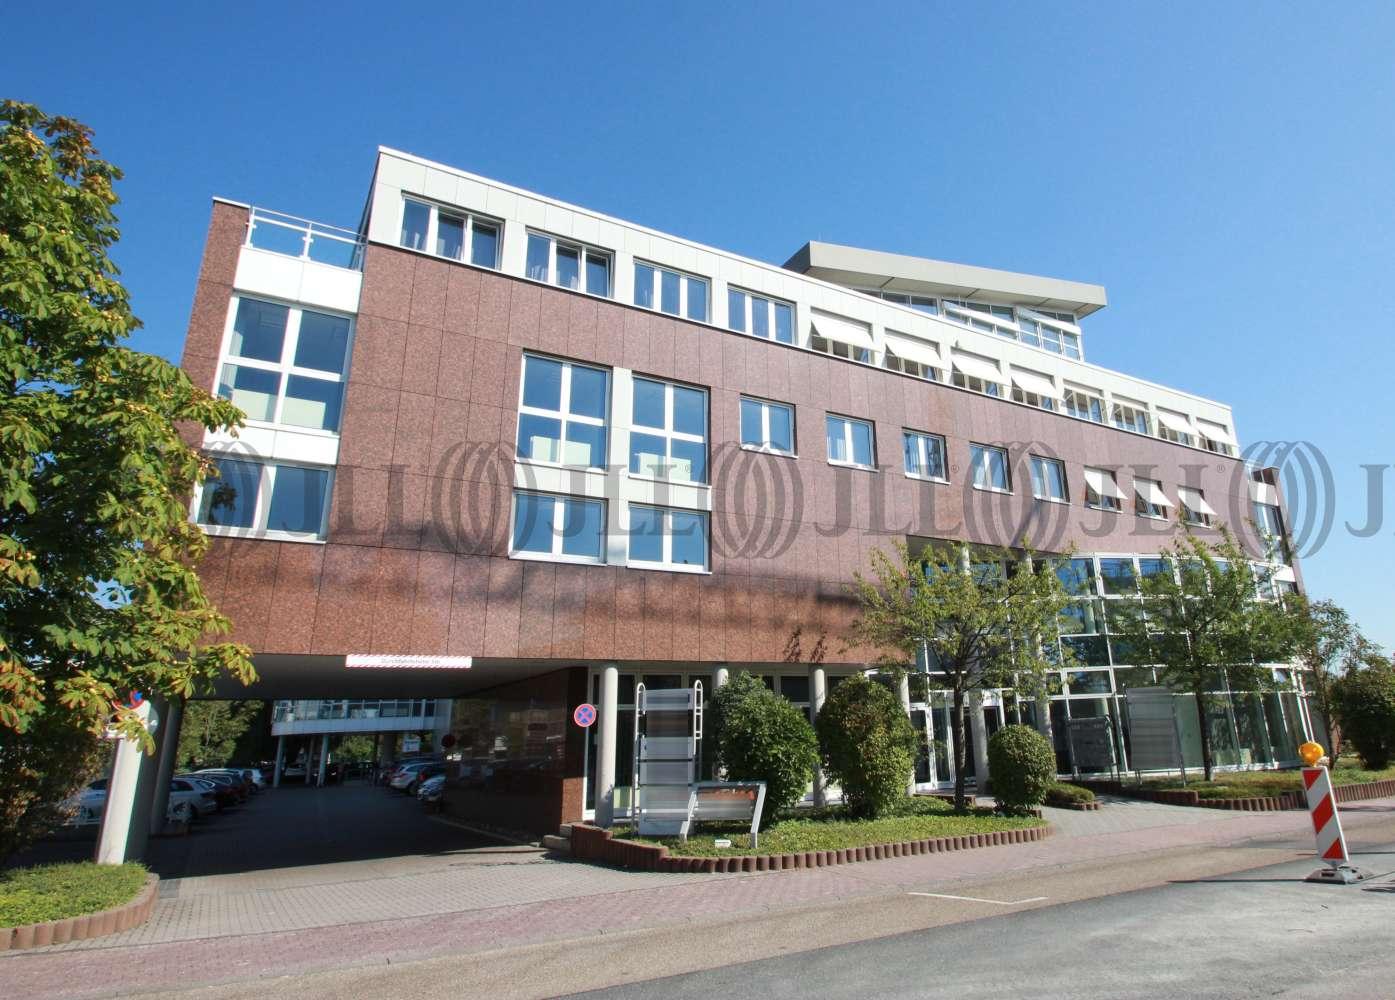 Büros Bad homburg vor der höhe, 61348